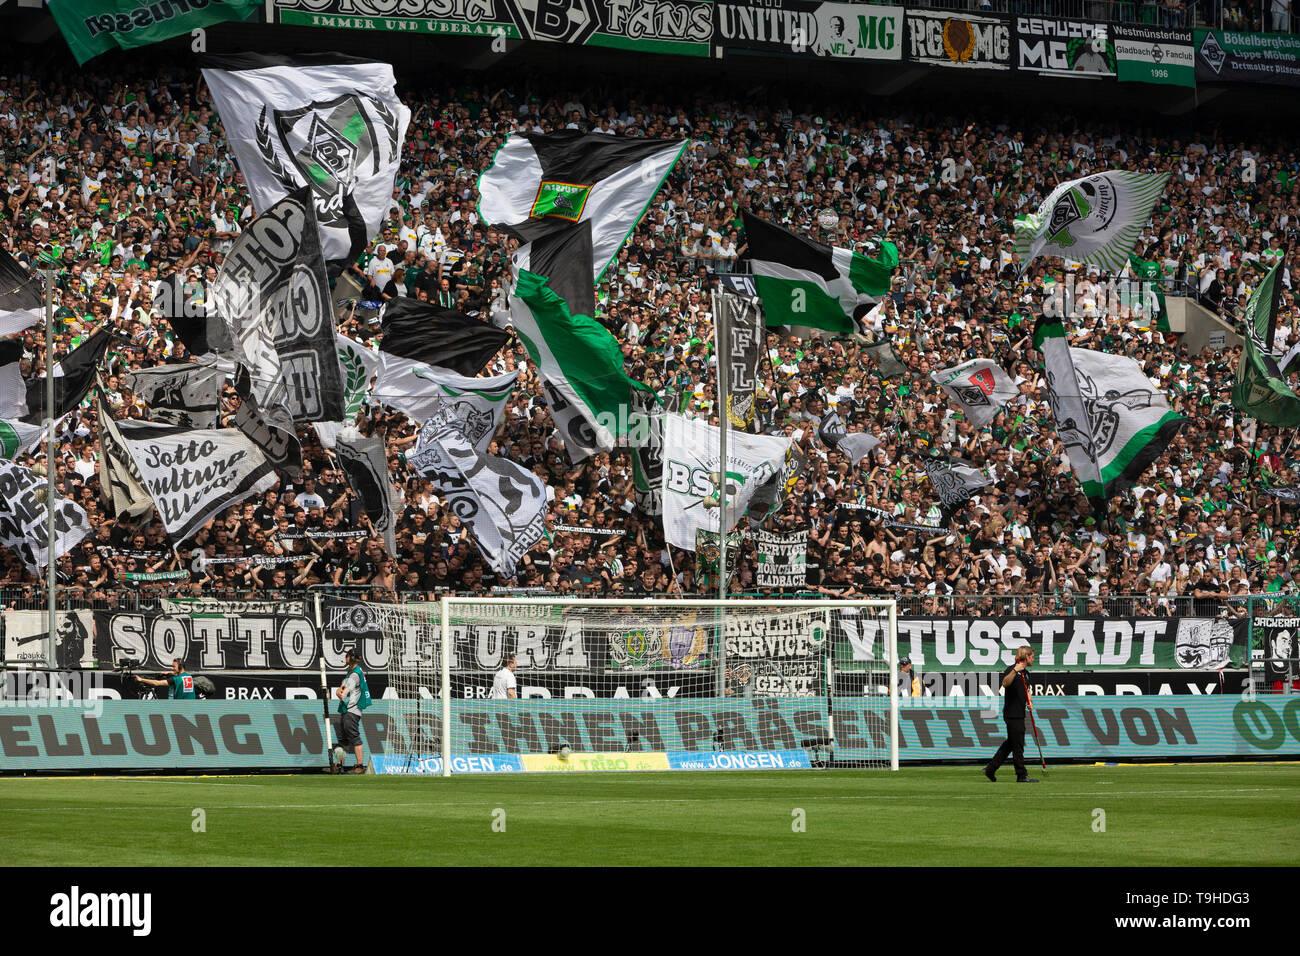 Sport, Fussball, Bundesliga, 2018/2019, Borussia Moenchengladbach vs. BVB Borussia Dortmund 0-2, Stadion Borussia-Park, Zuschauerkulisse, Gladbacher Fussballfans in der Nordkurve, Fahnenmeer, DFL REGULATIONS PROHIBIT ANY USE OF PHOTOGRAPHS AS IMAGE SEQUENCES AND/OR QUASI-VIDEO, sports, football, Bundesliga, 2018/2019, Borussia Moenchengladbach vs. BVB Borussia Dortmund 0-2, Stadium Borussia Park, Gladbach football fans in the Nordkurve, flags, DFL REGULATIONS PROHIBIT ANY USE OF PHOTOGRAPHS AS IMAGE SEQUENCES AND/OR QUASI-VIDEO *** Local Caption *** sports, football, Bundesliga, 2018/2019, Bor - Stock Image